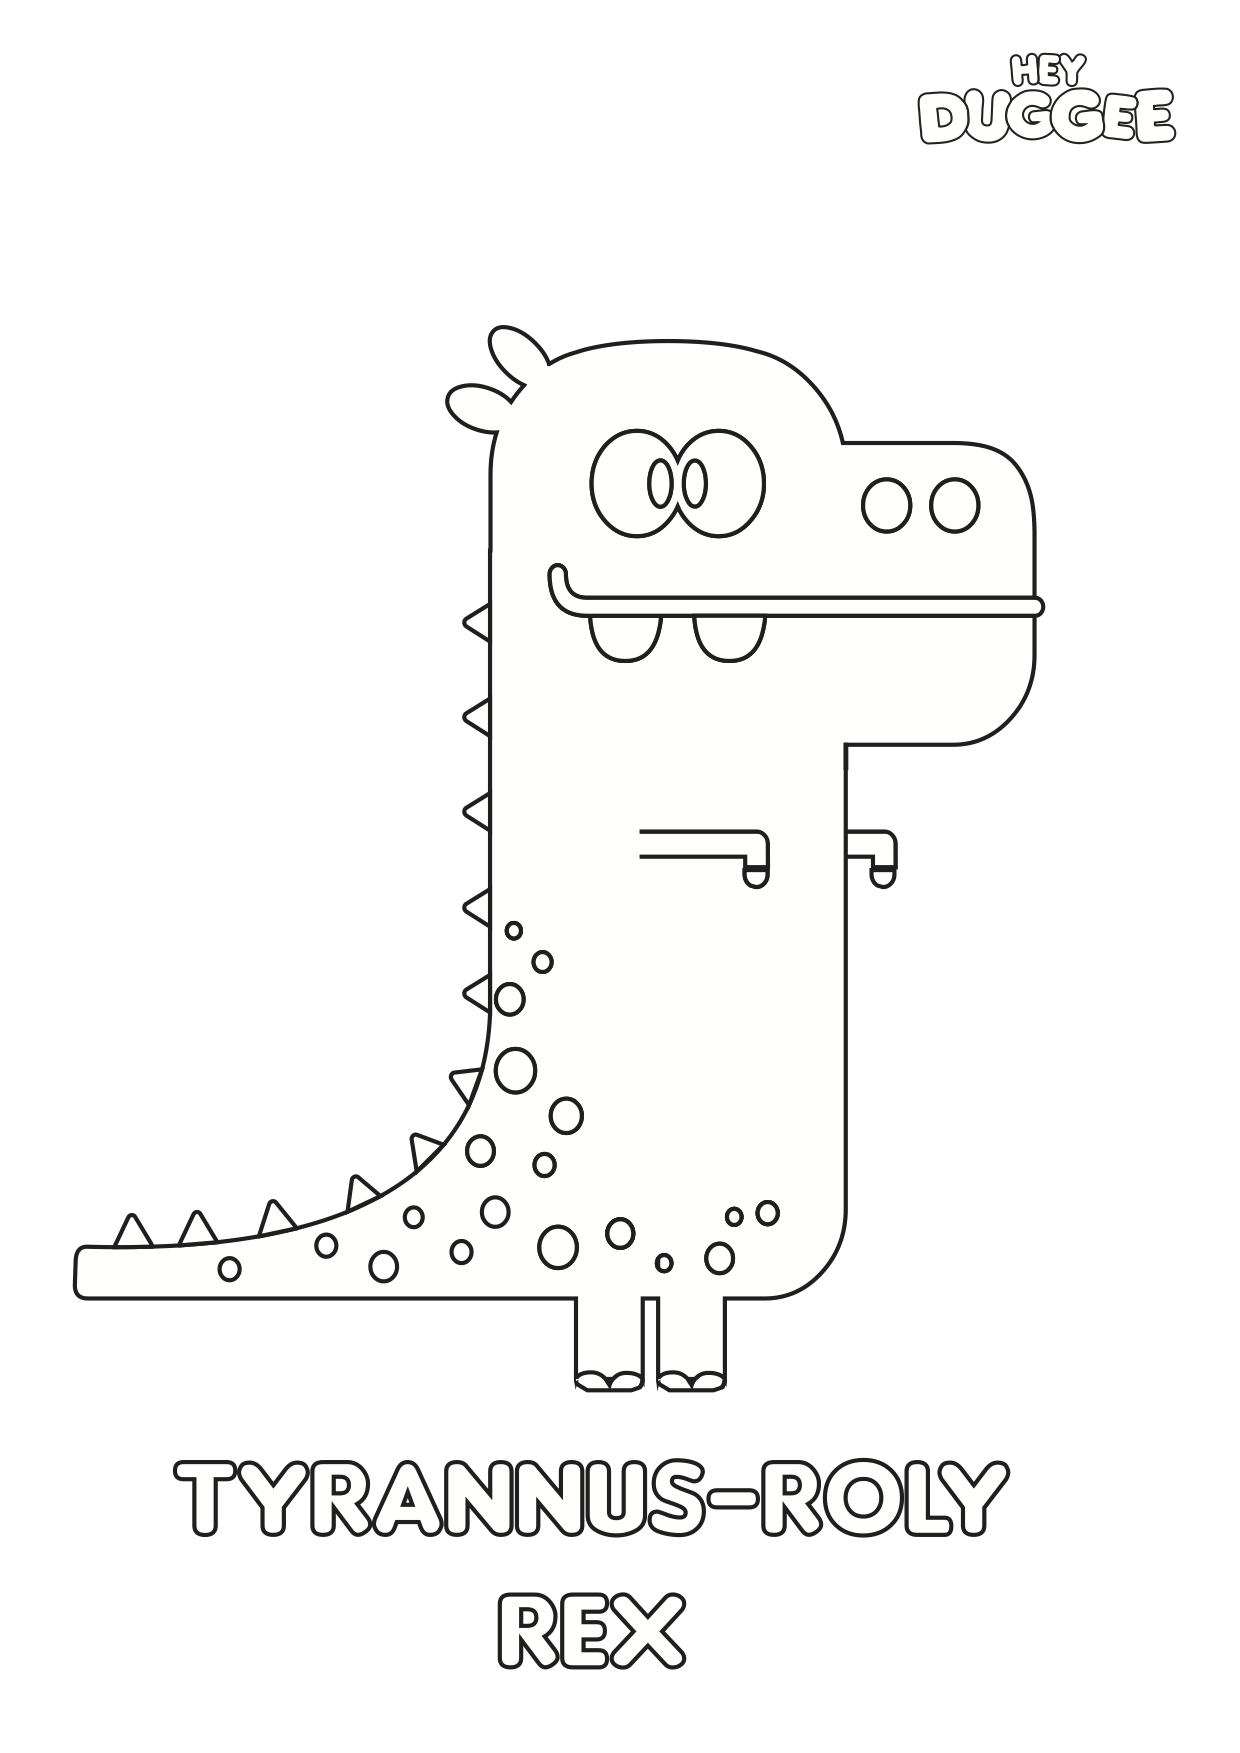 Tyrannus-roly rex